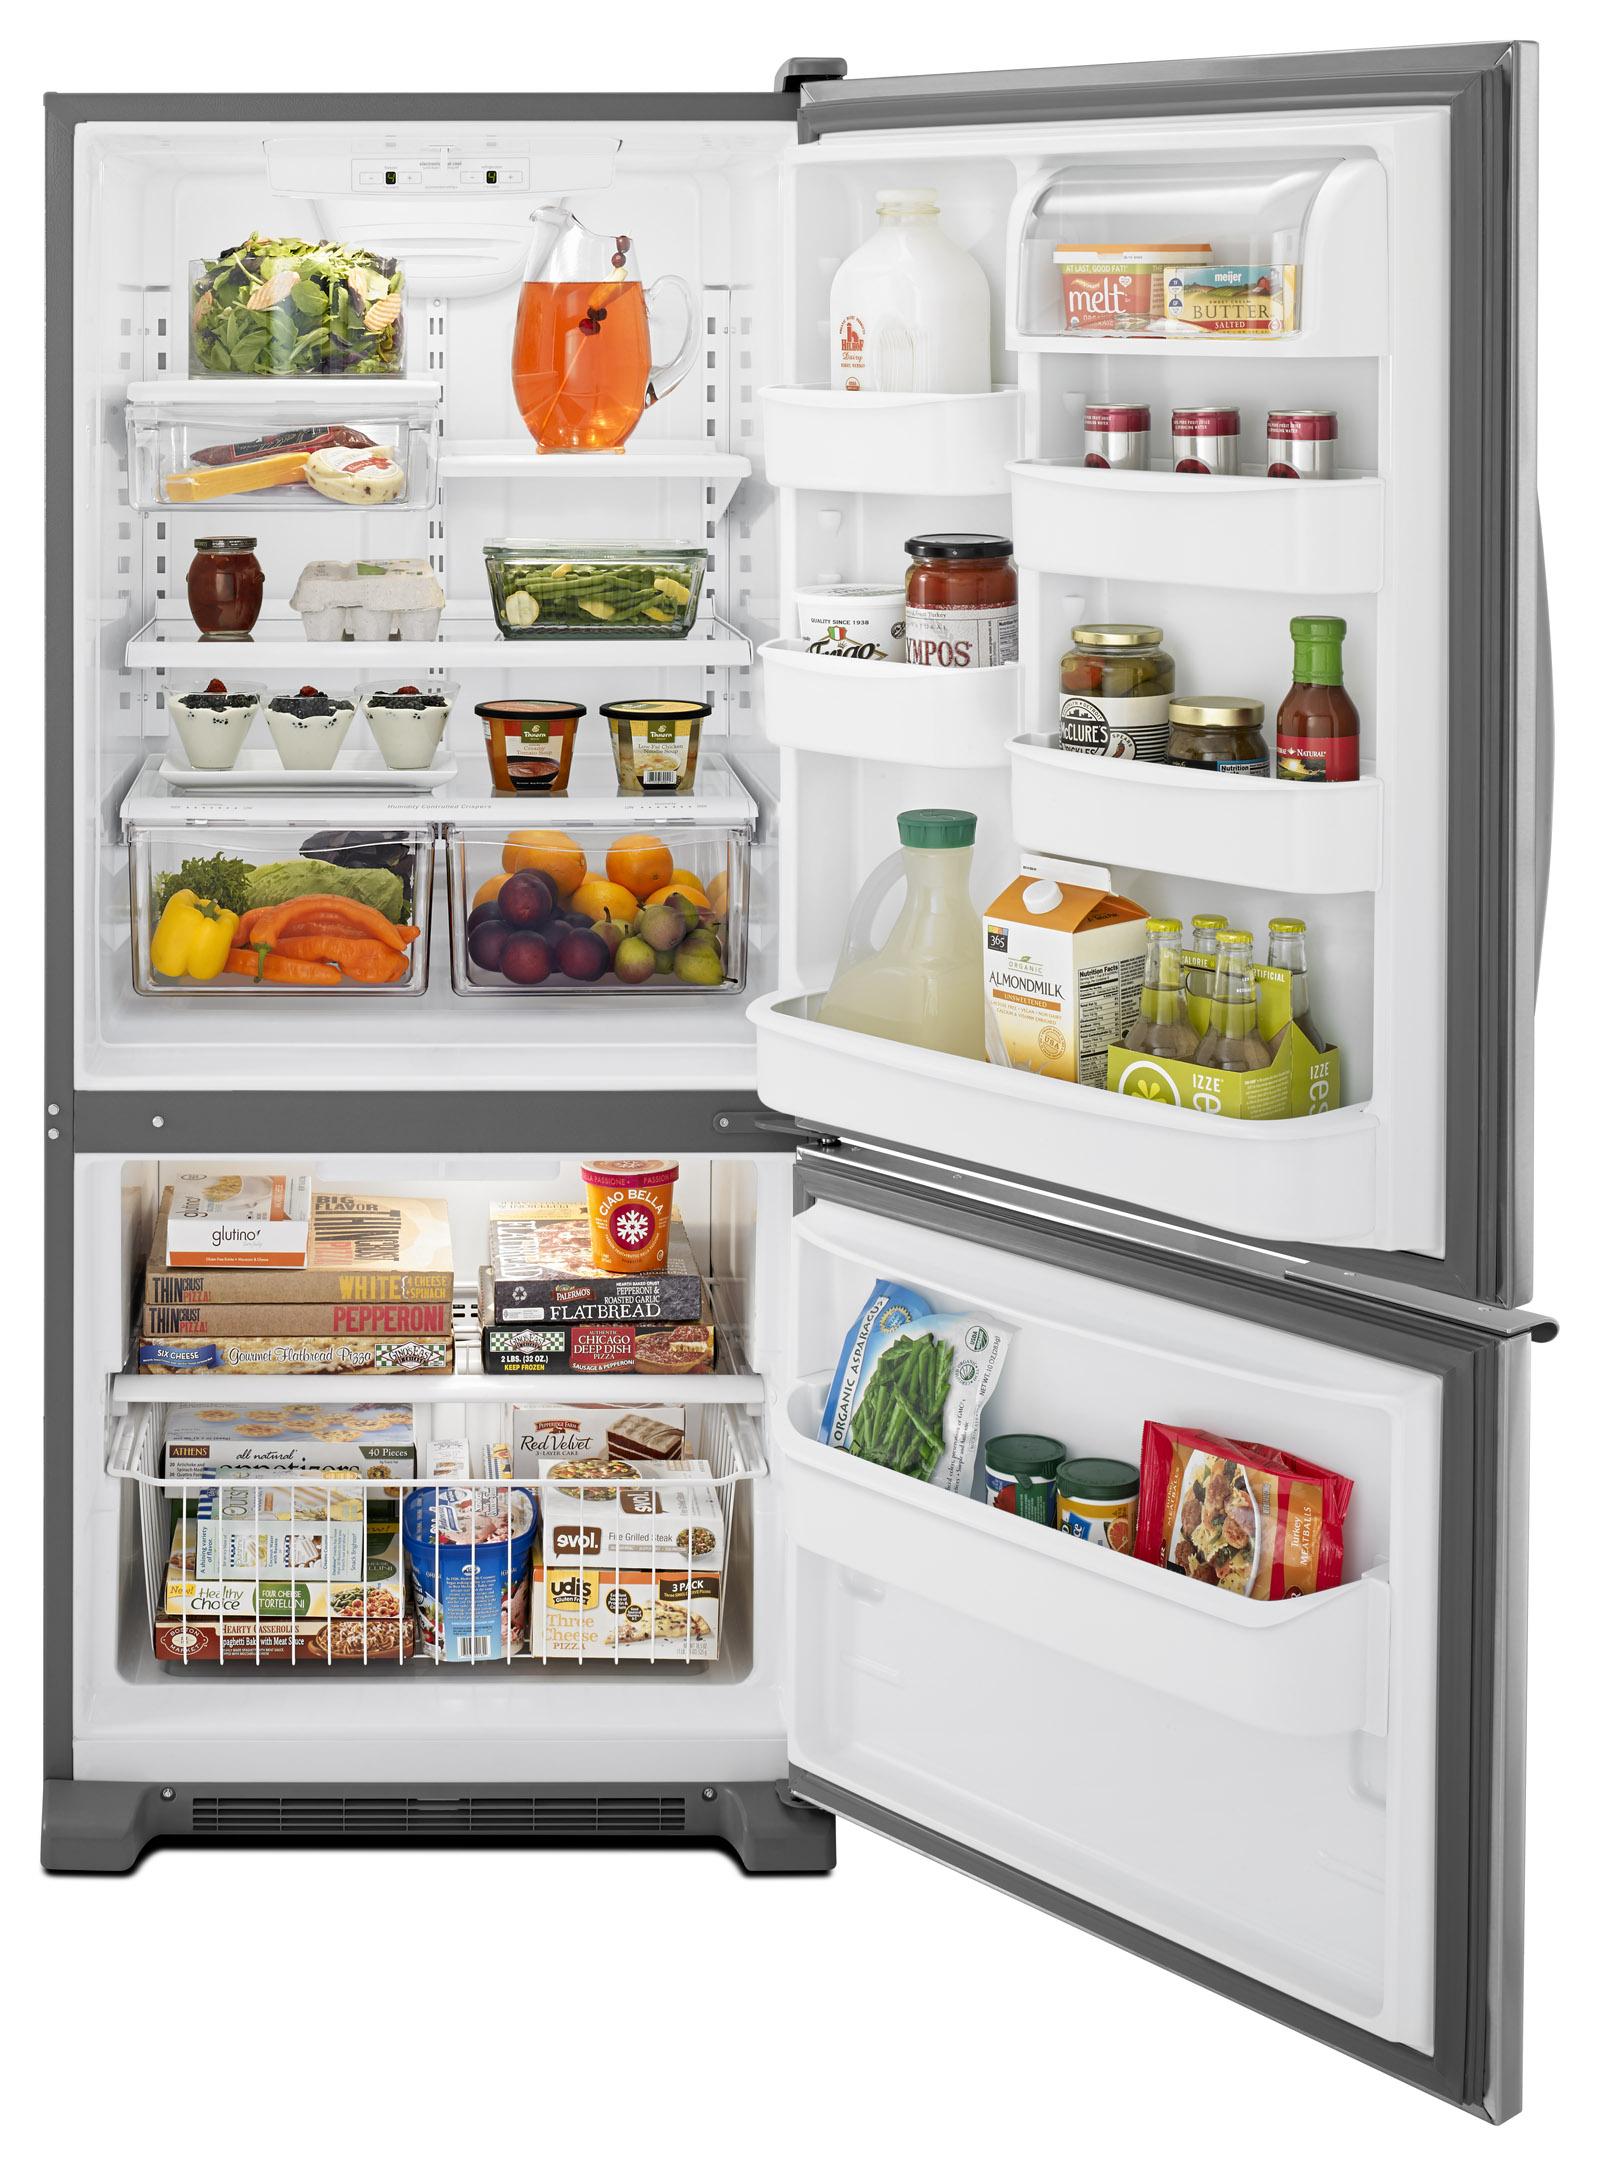 Whirlpool WRB119WFBM 19 cu. ft. Single Door Bottom Freezer Refrigerator w/ Adaptive Defrost - Stainless Steel